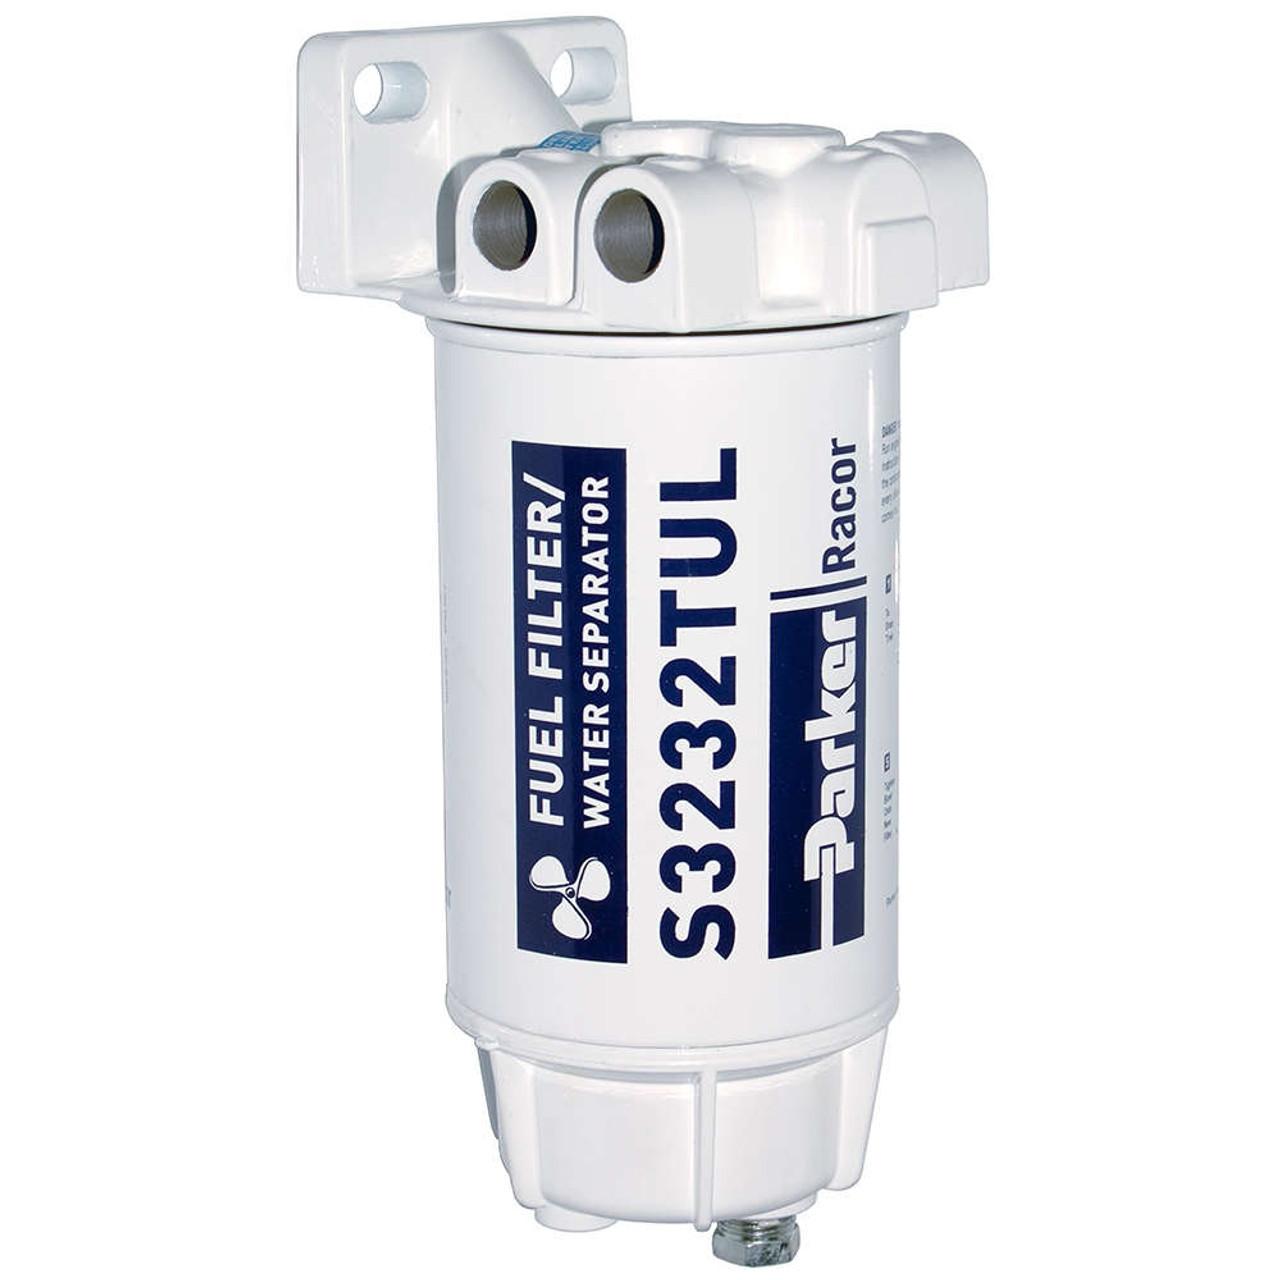 racor aquabloc marine 3 8 in 90 gph spin on gasoline filter Racor Marine Gas Filter racor aquabloc marine 3 8 in 90 gph spin on gasoline filter assembly